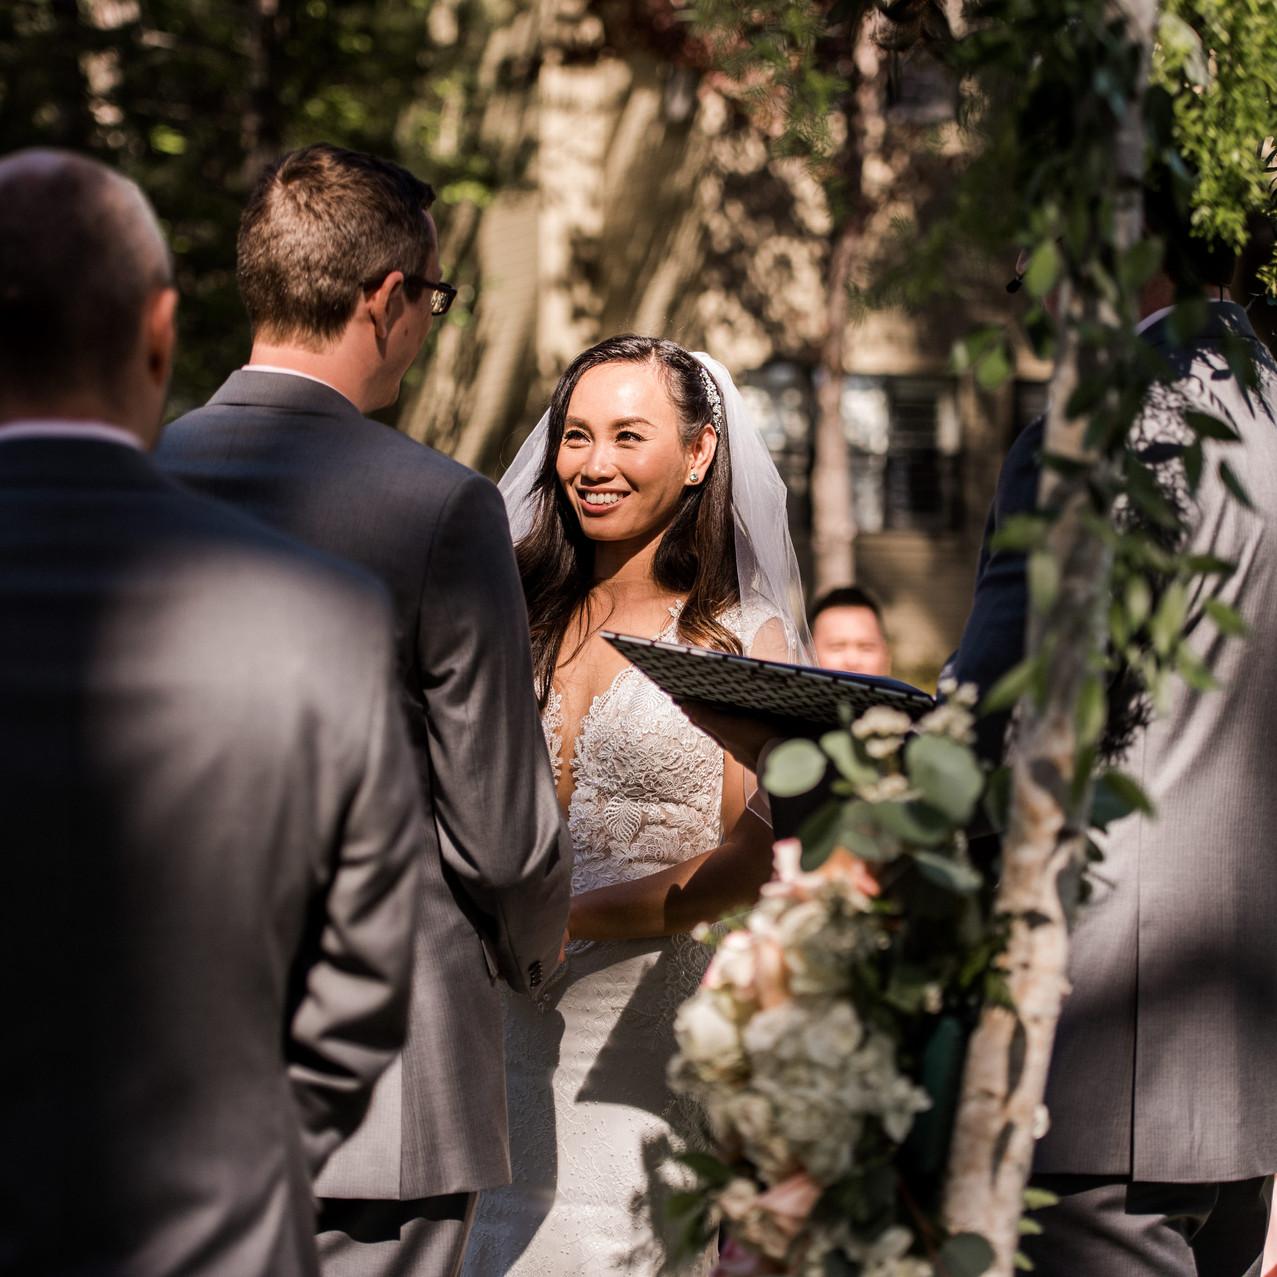 A-Floral-Affair-HYATT-LAKE-TAHOE-WEDDING-FLORIST (9)